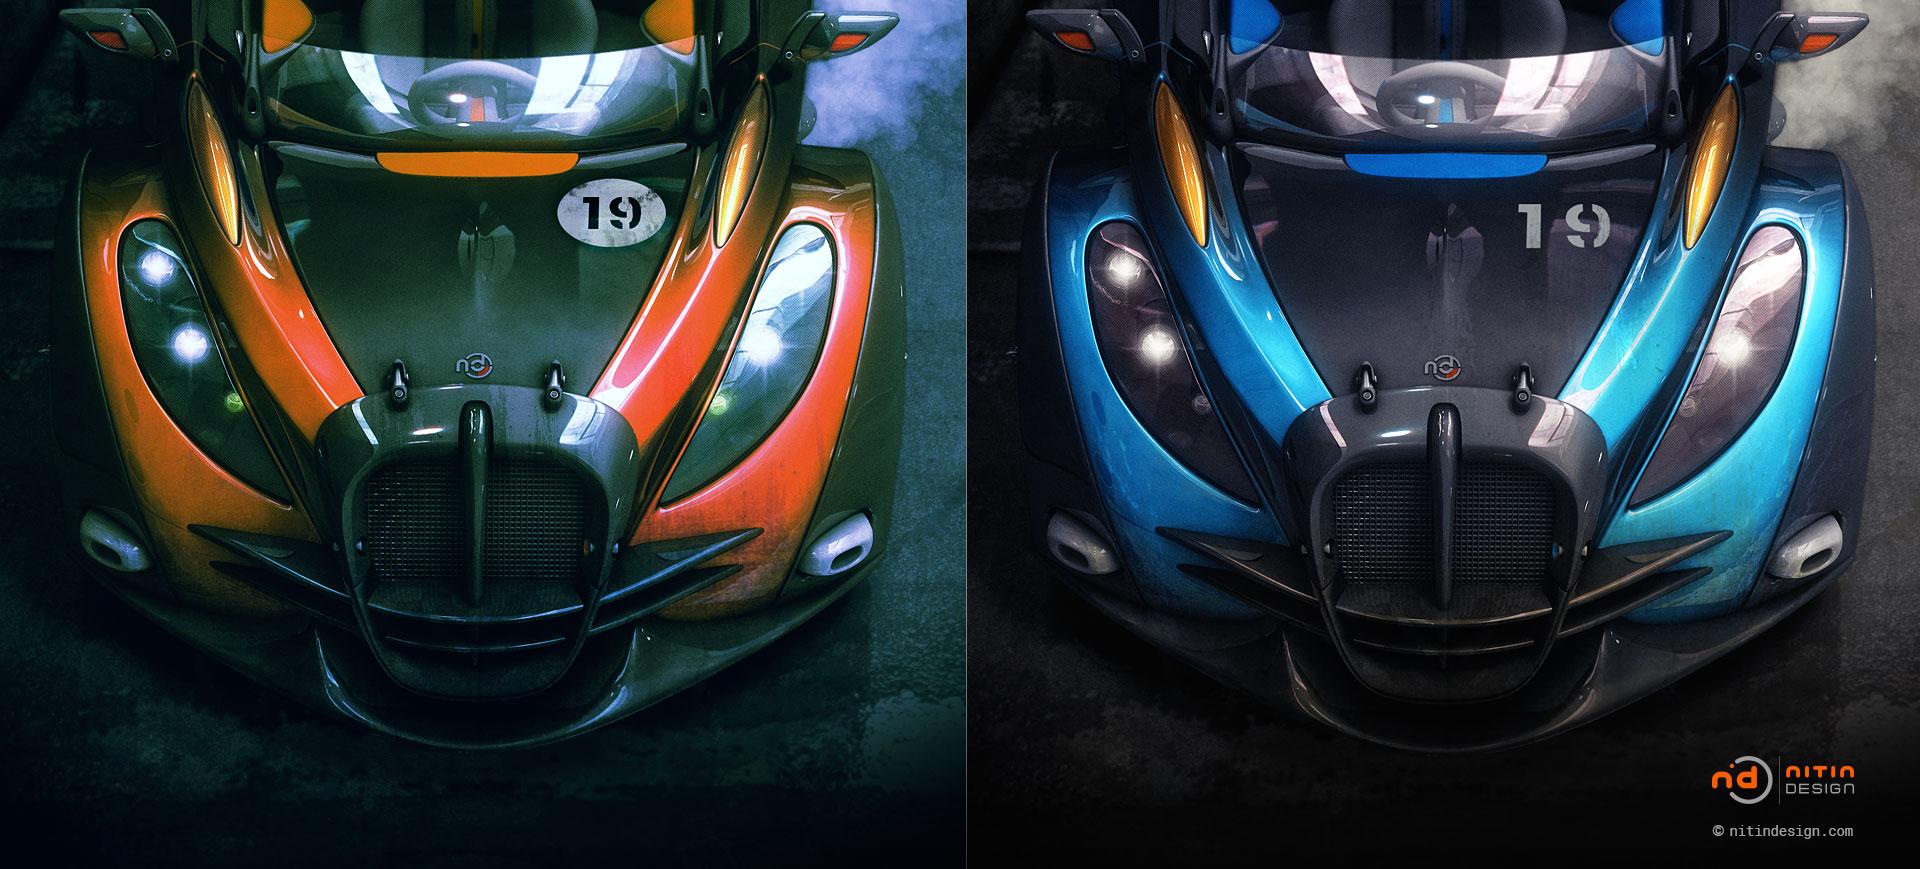 Moksha-Concept-Car--Nitin-Design